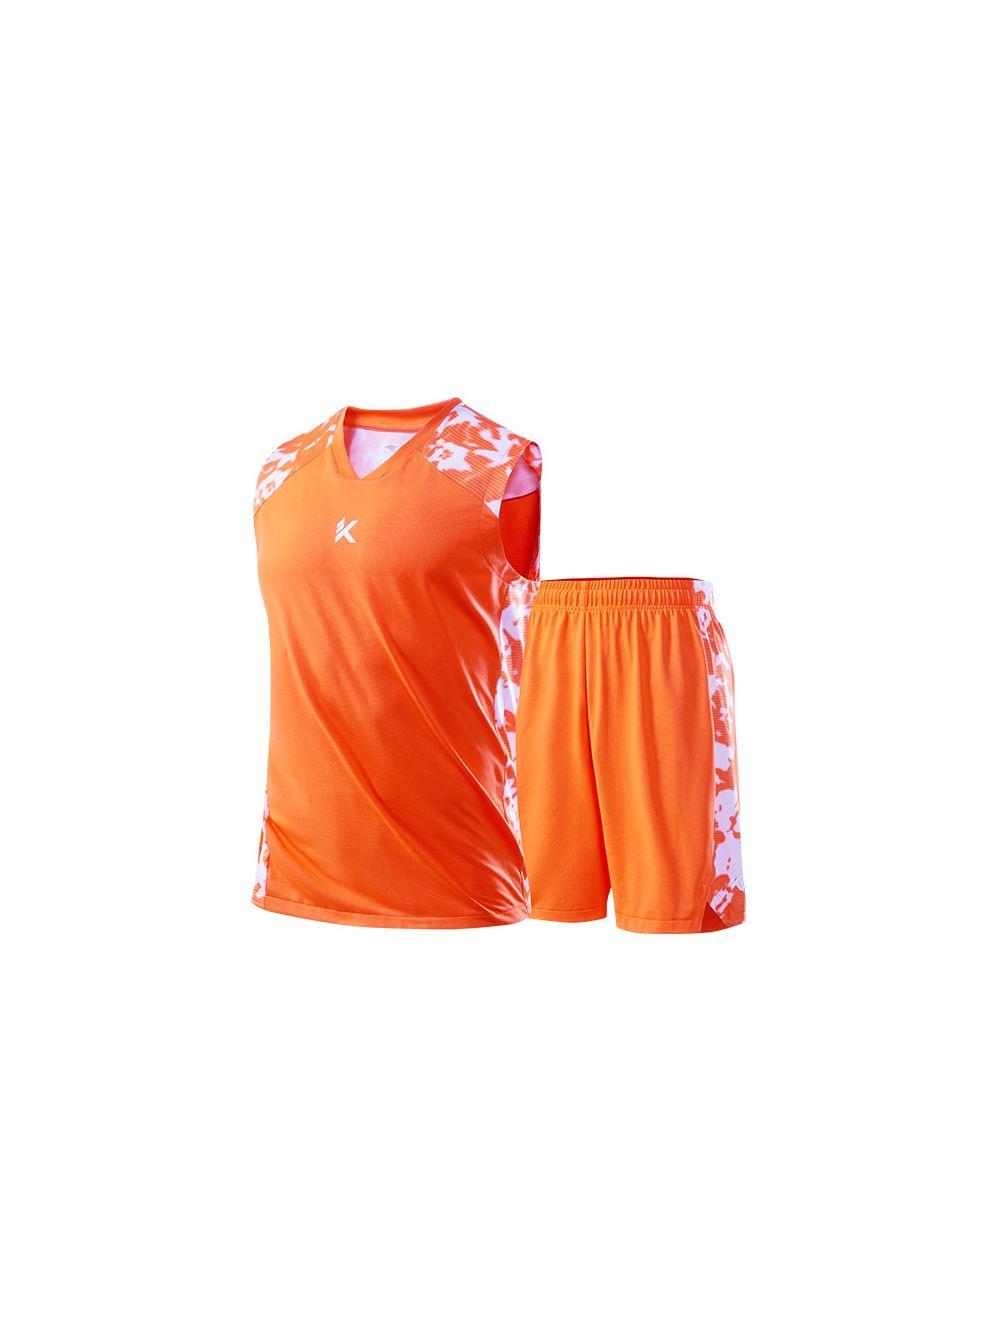 big sale f0f9b 955aa Anta Klay Thompson KT 2019 Men's Basketball Jersey & Shorts - Orange